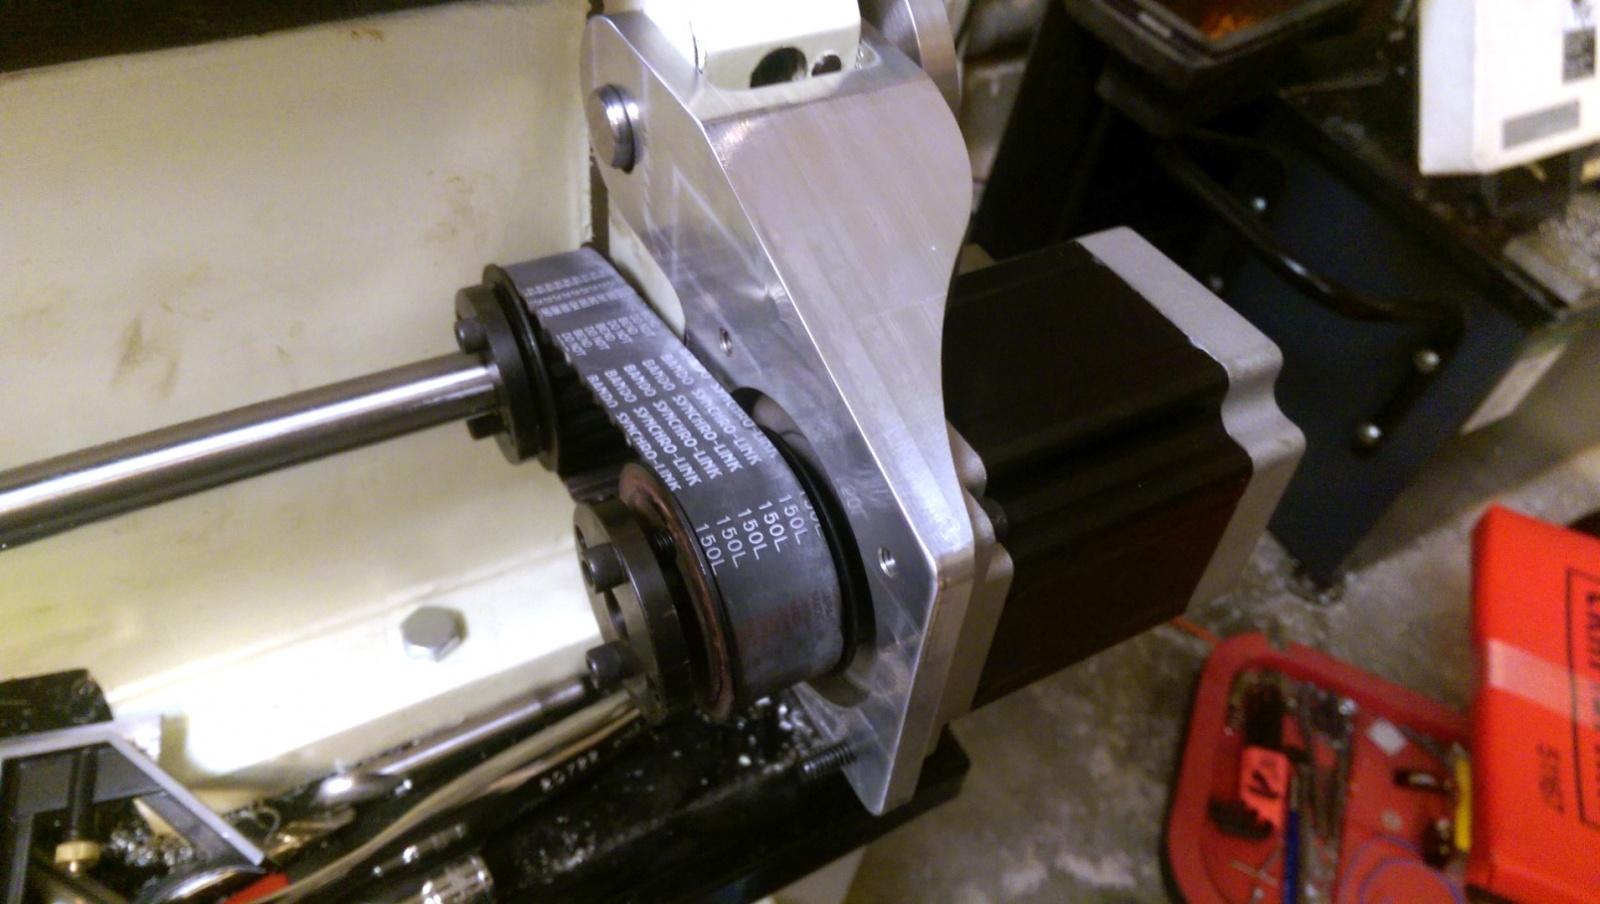 Модернизация токарного станка под работу с ЧПУ - 5